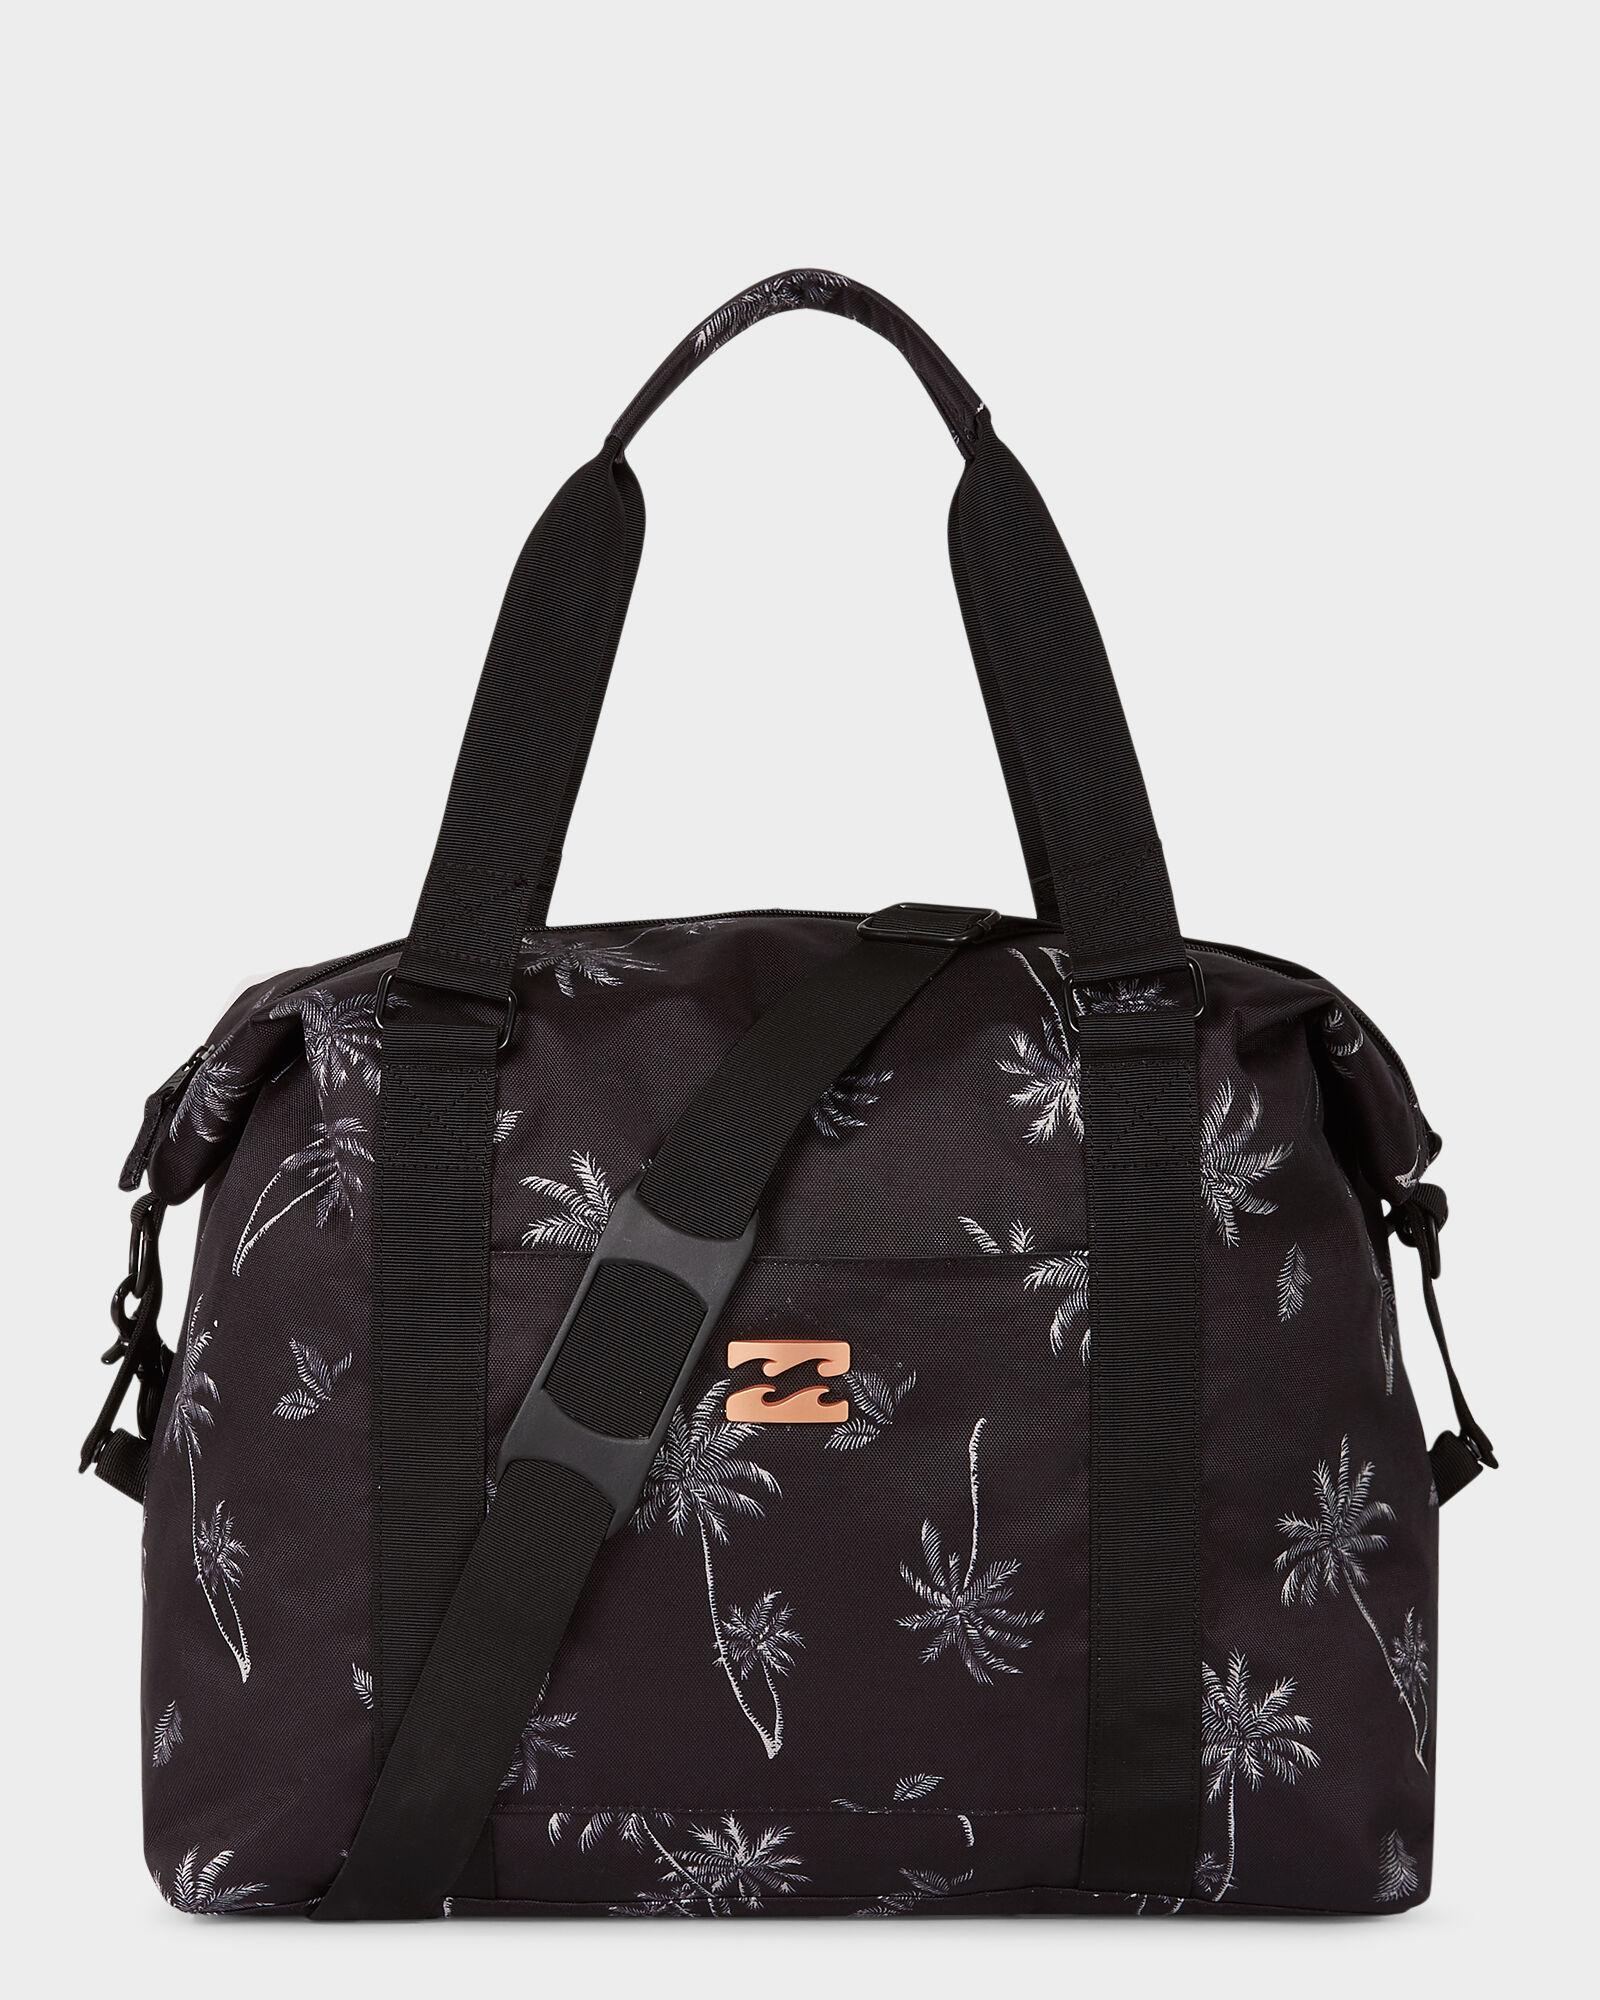 Billabong Palms Up Tote Bag Ladies Bags Black